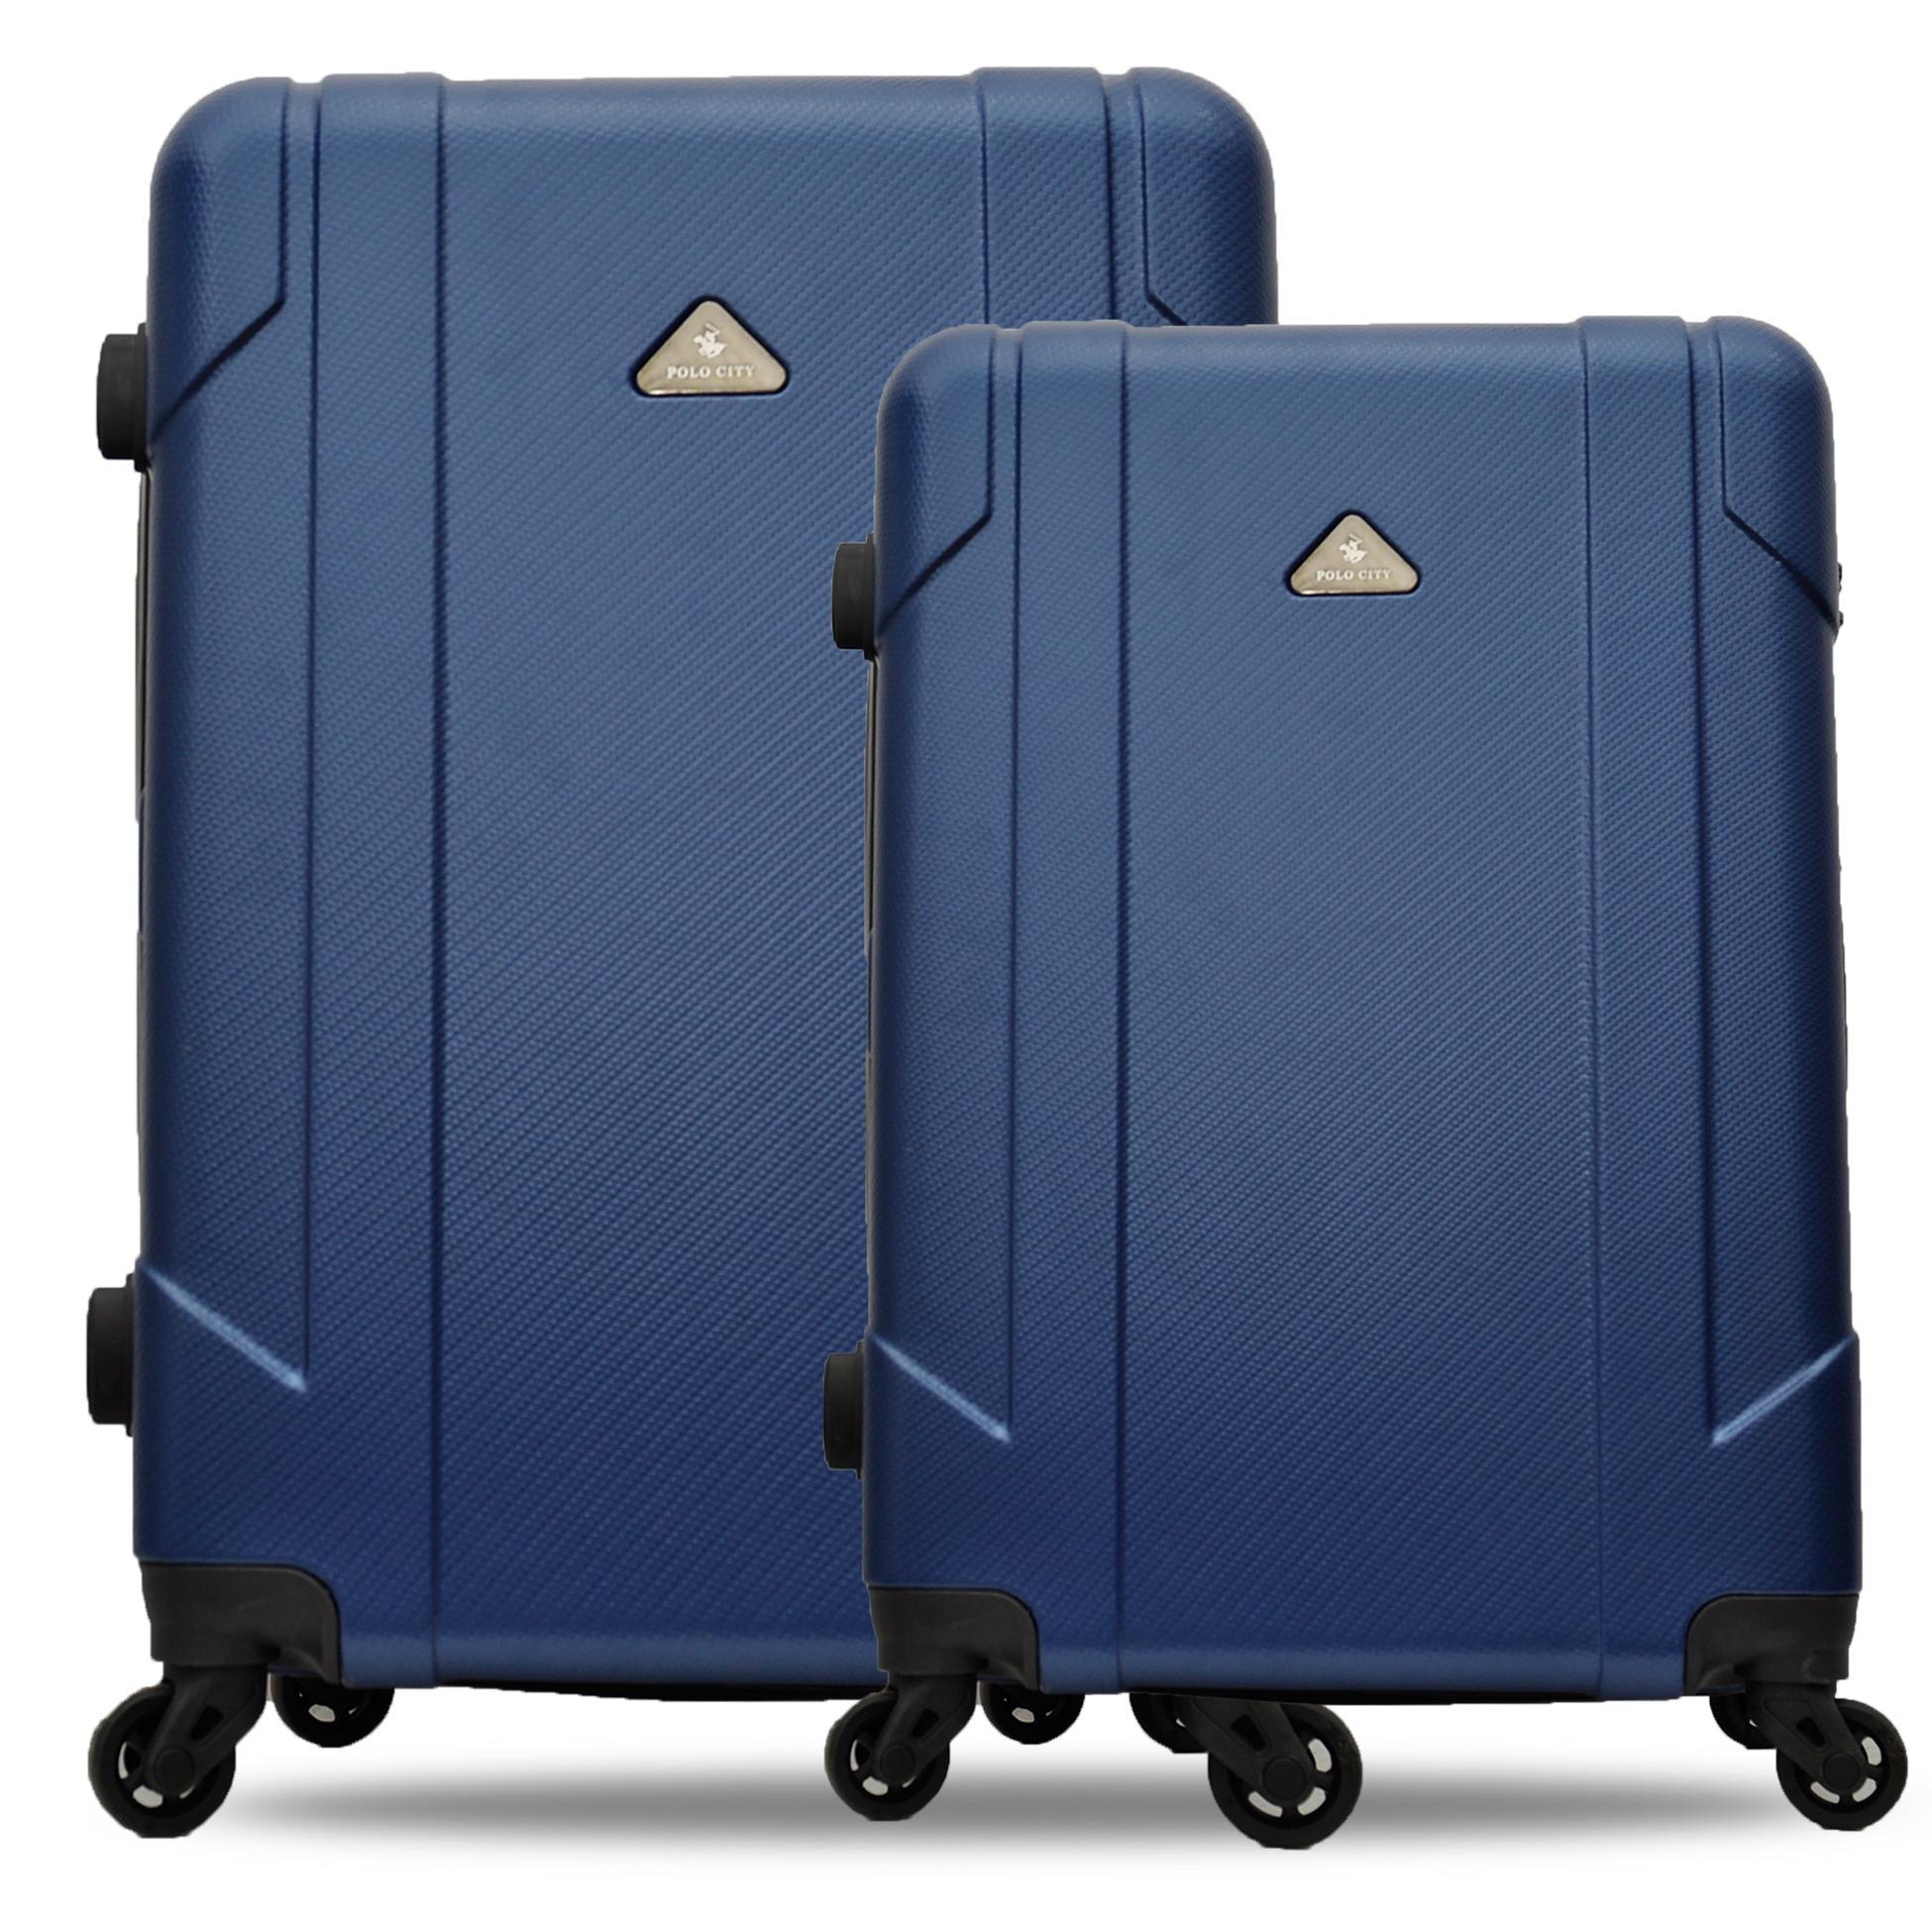 aafa299452f8 Polo City Tas Koper Hardcase SET size 20+24 inch - 303